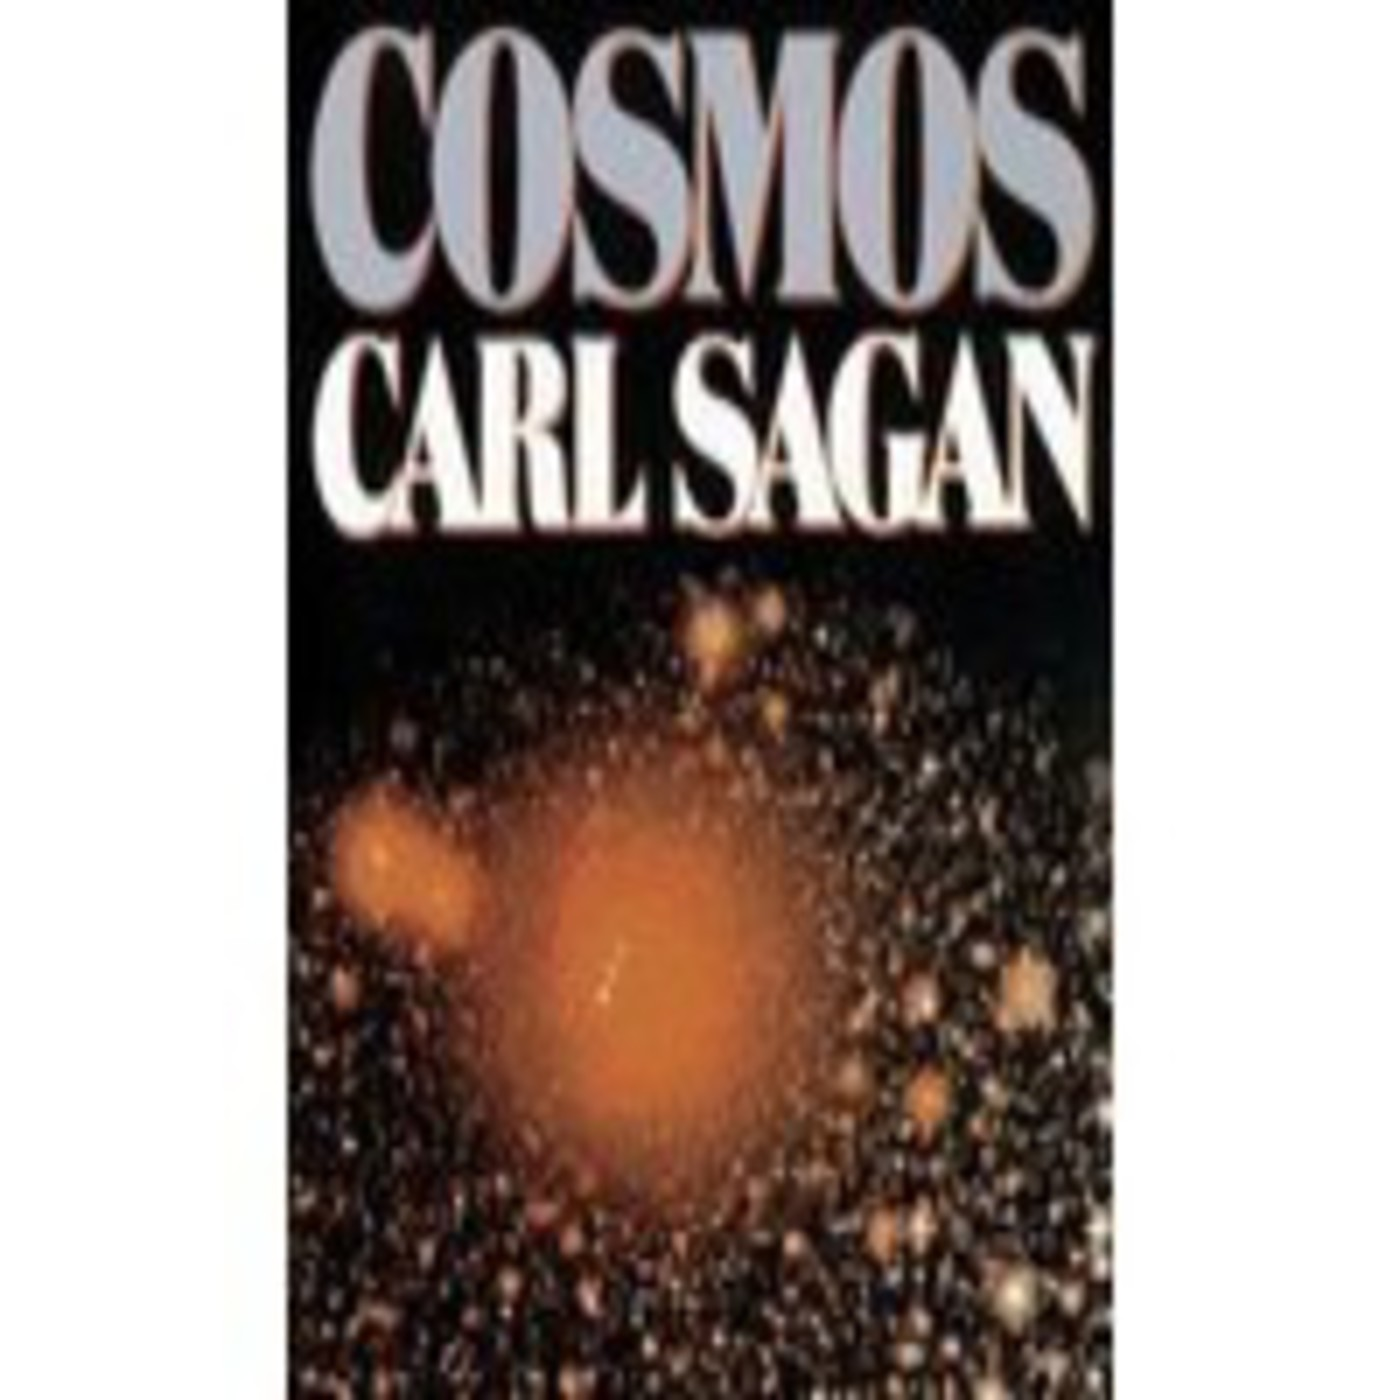 COSMOS (Carl Sagan) - Blues para un planeta rojo